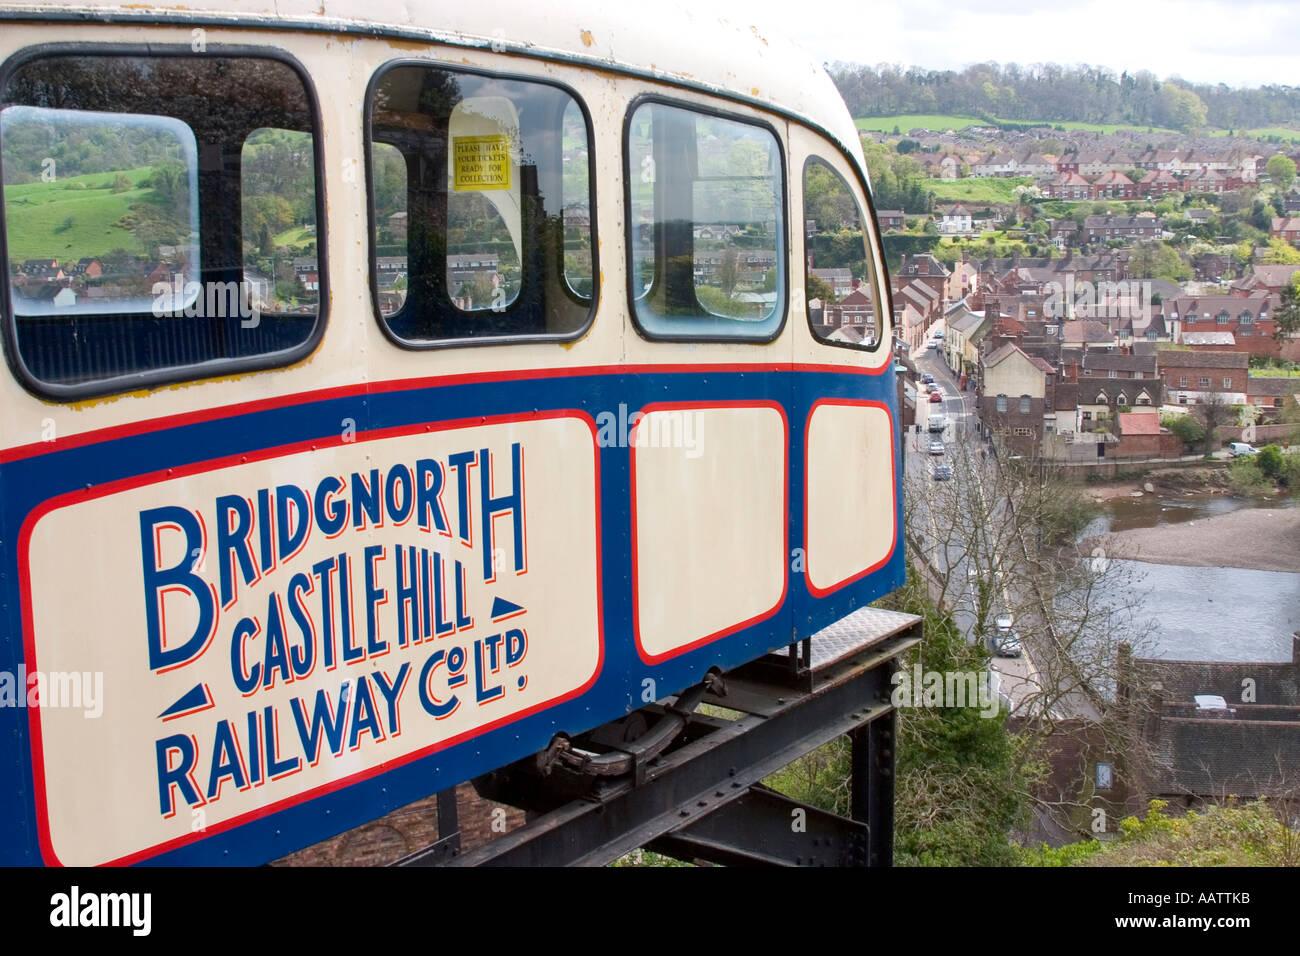 Bridgenorth Castle Hill Railway. Stock Photo